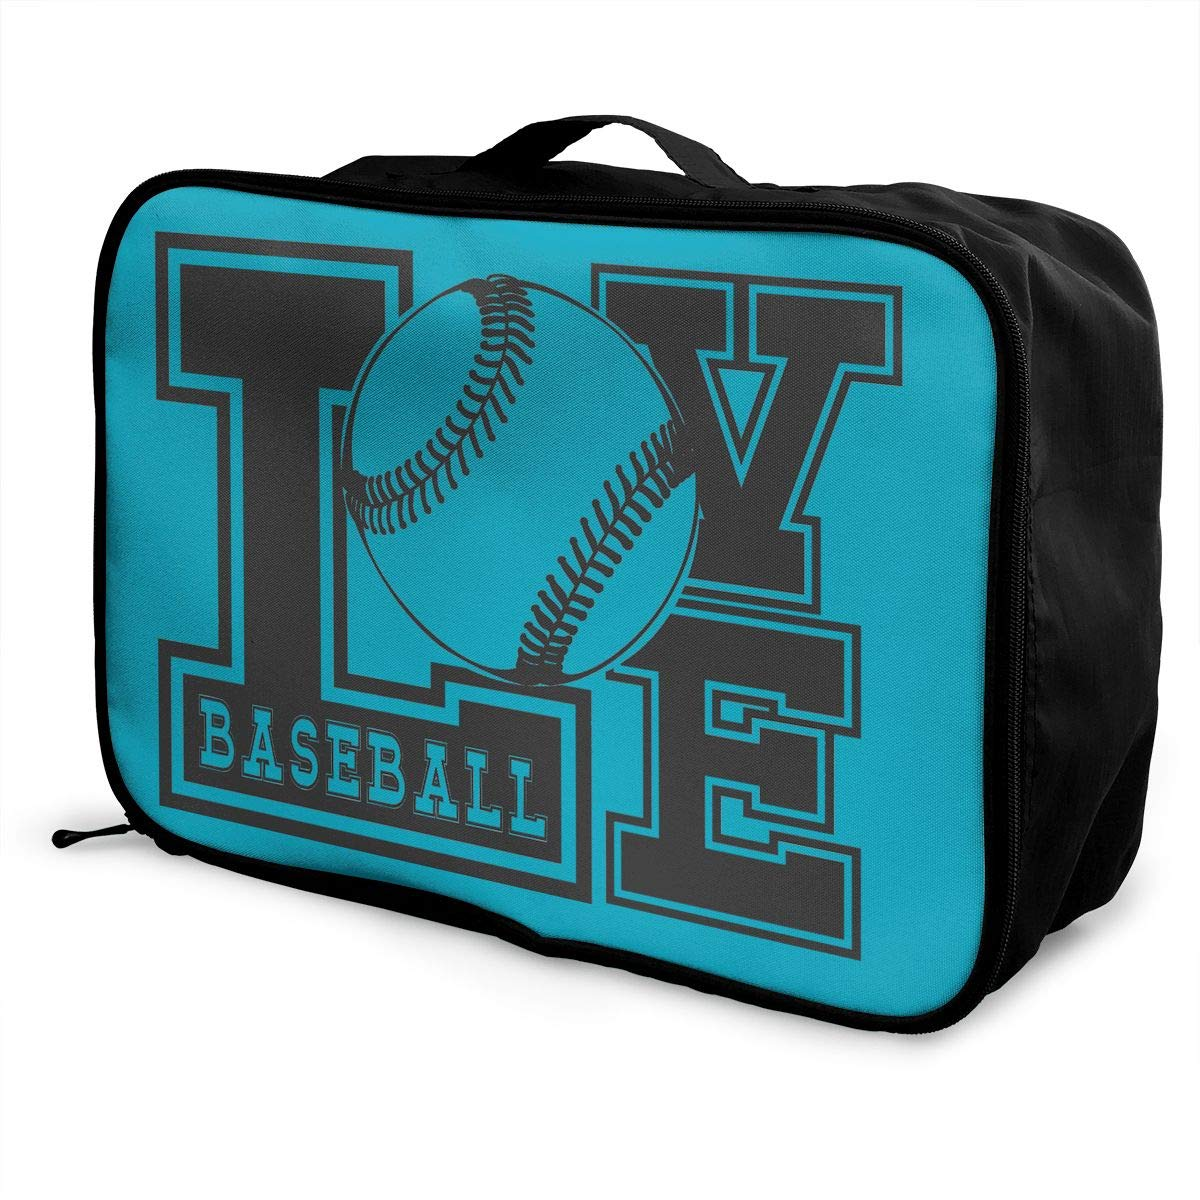 Travel Luggage Duffle Bag Lightweight Portable Handbag Love Baseball Large Capacity Waterproof Foldable Storage Tote